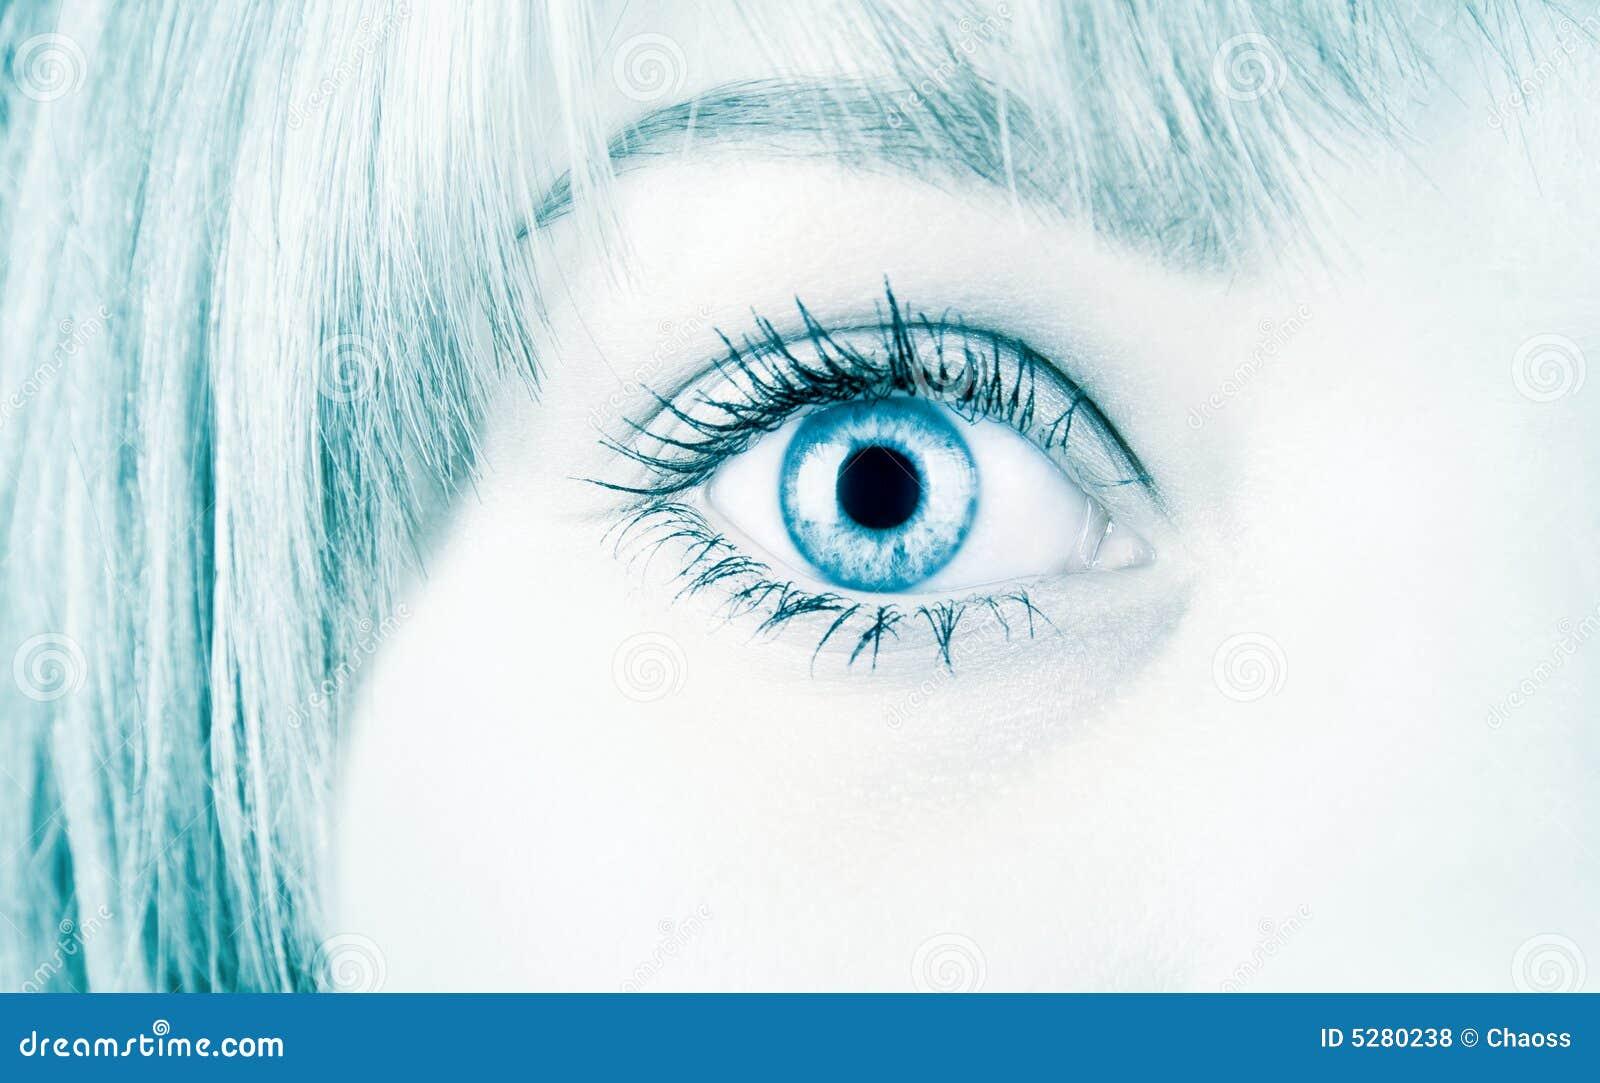 Woman Eye In Hi Tech Style Royalty Free Stock Photos